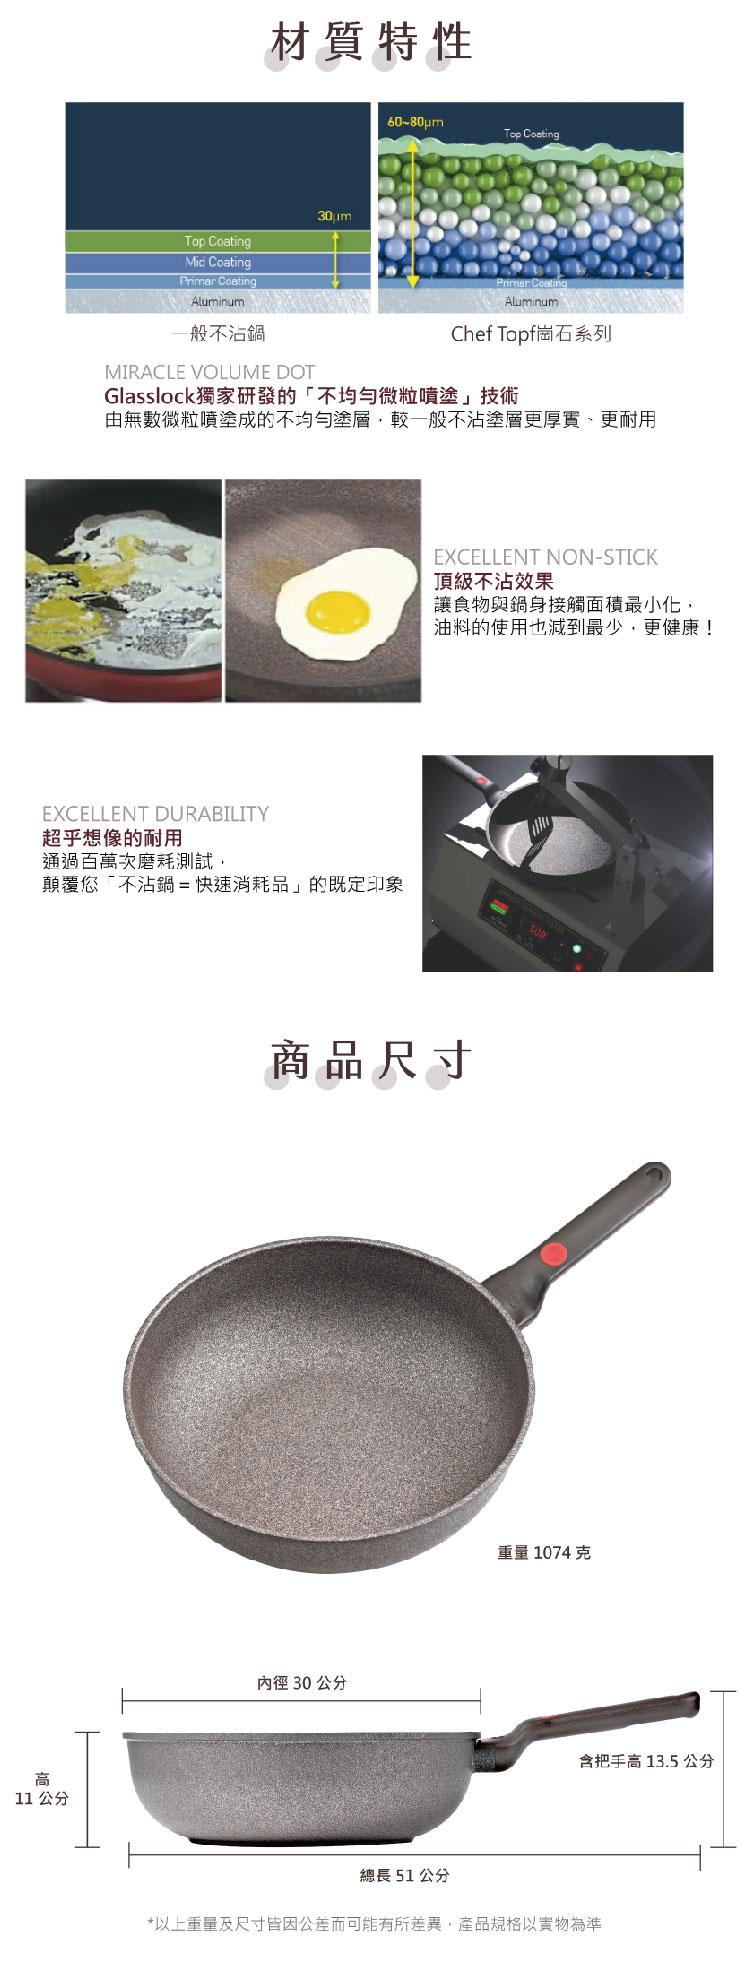 CHEF TOPF崗石系列不沾炒鍋+玻璃蓋材質特色